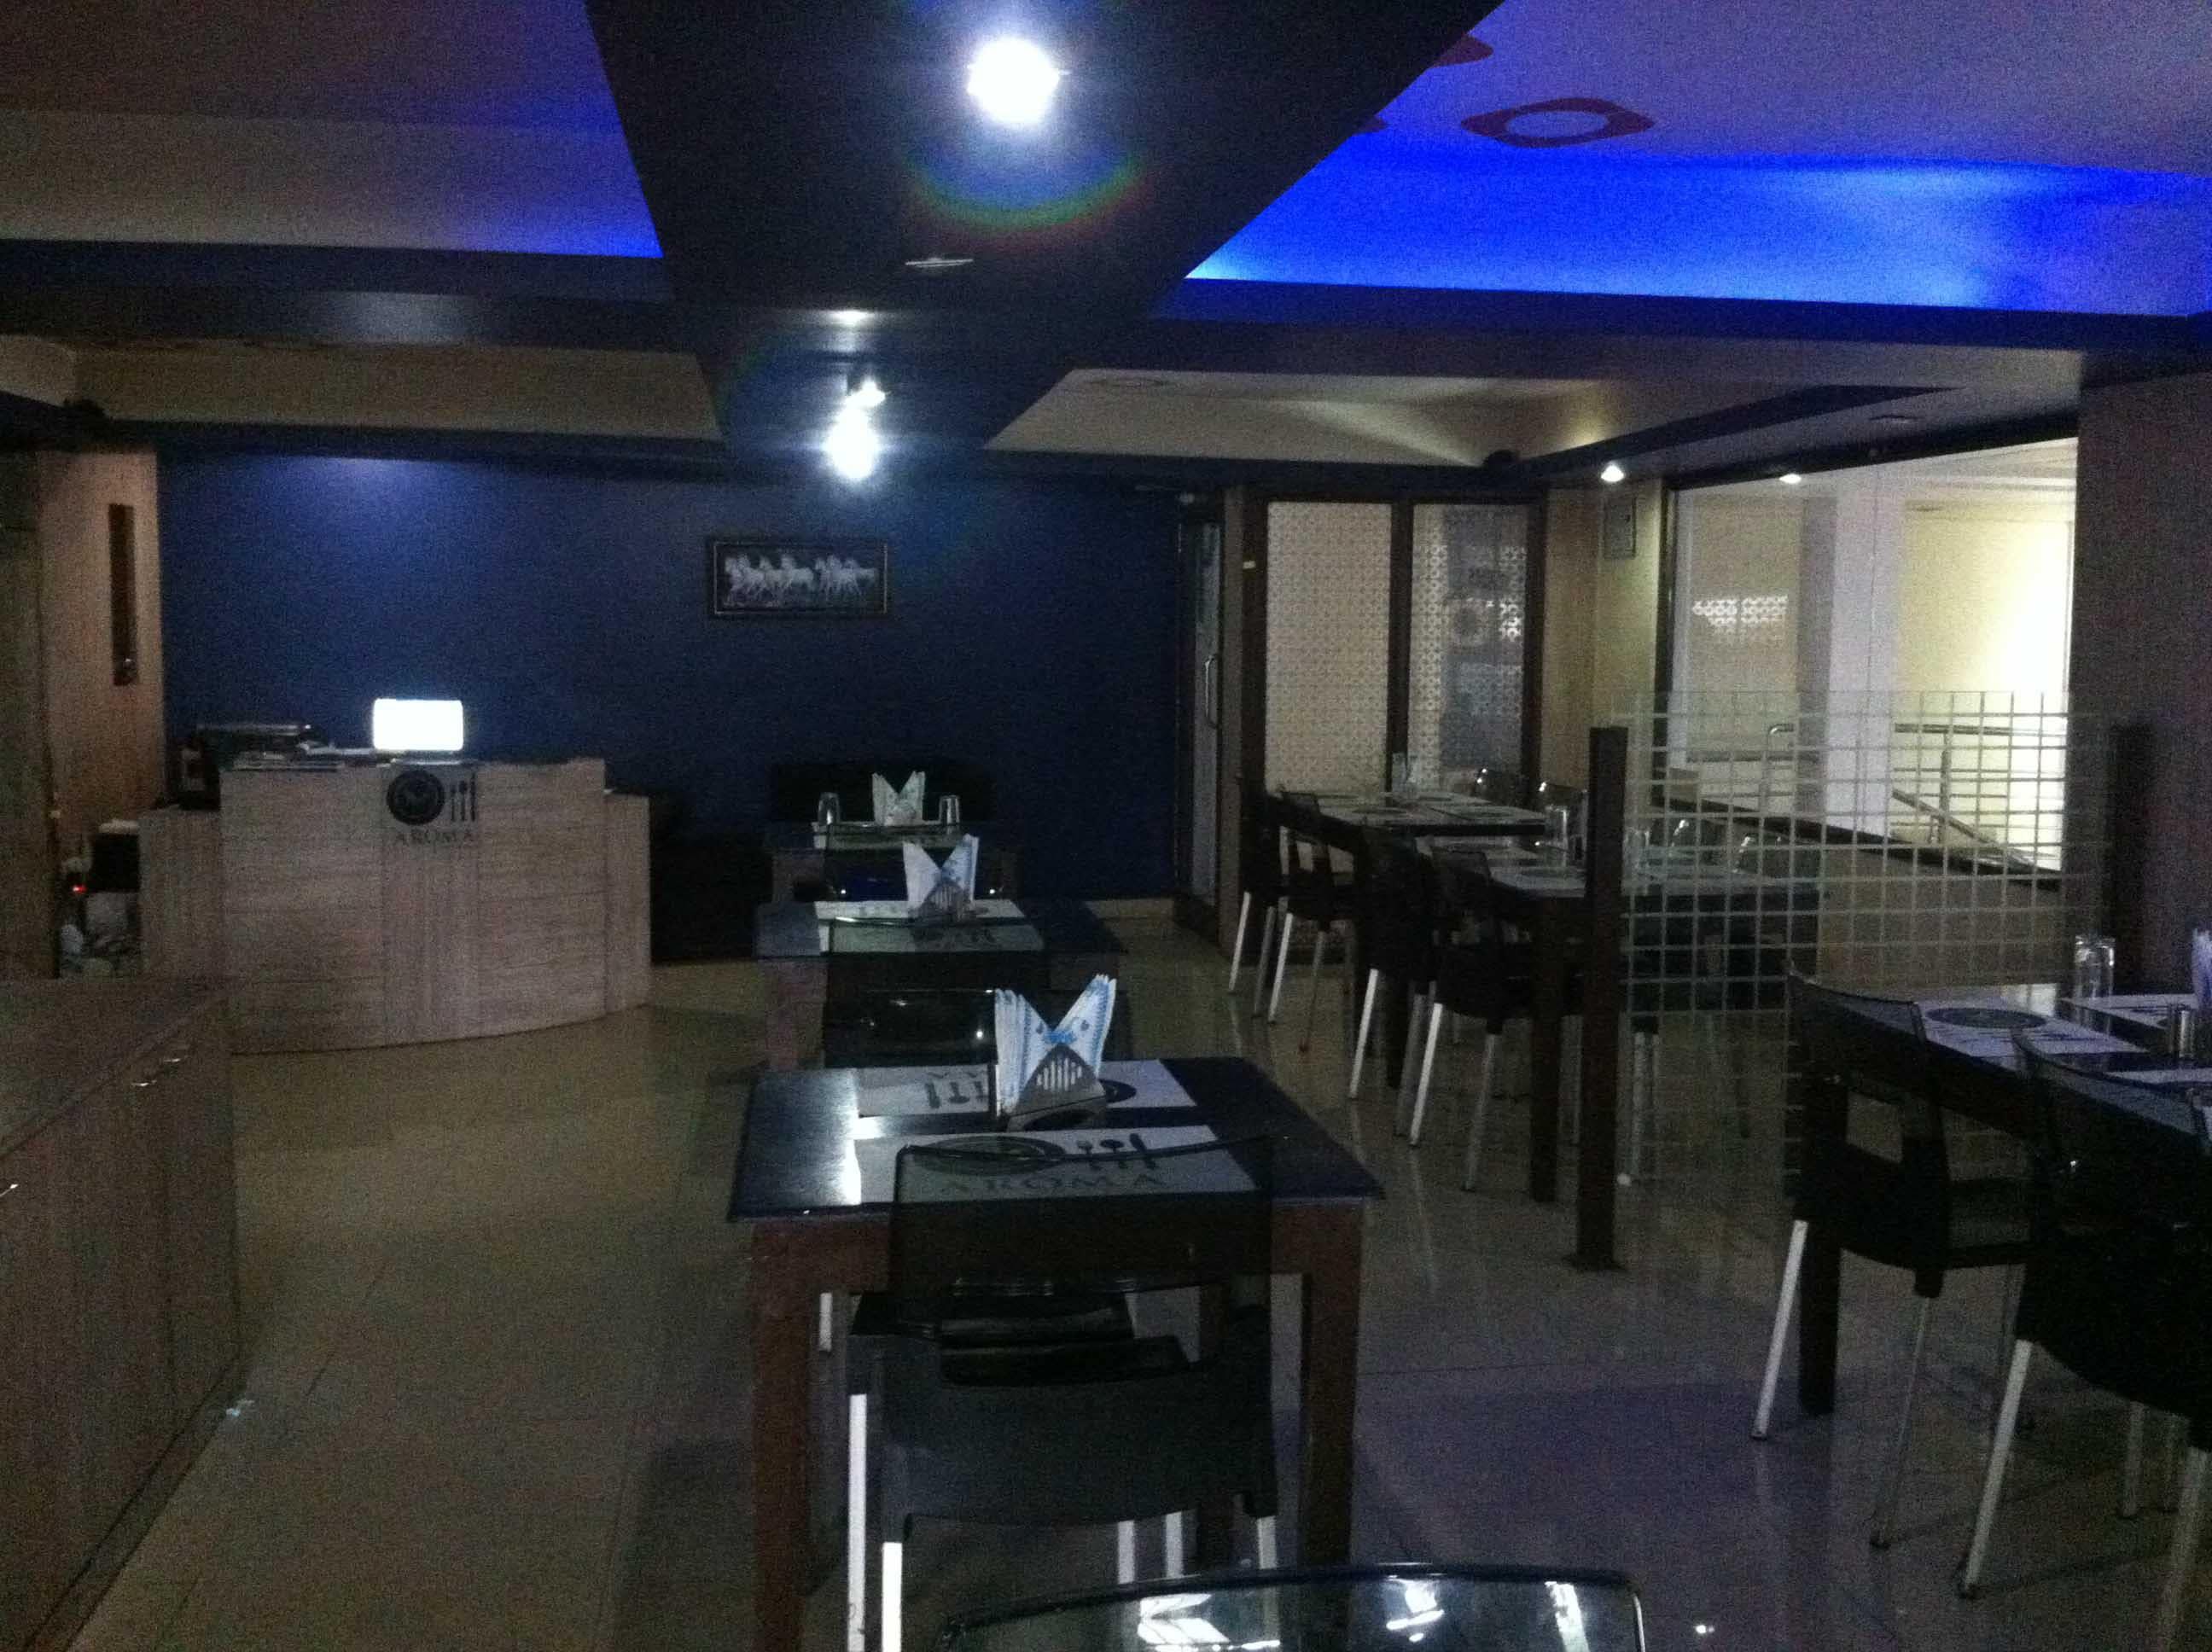 Aroma Restaurant - Ulubari - Guwahati Image